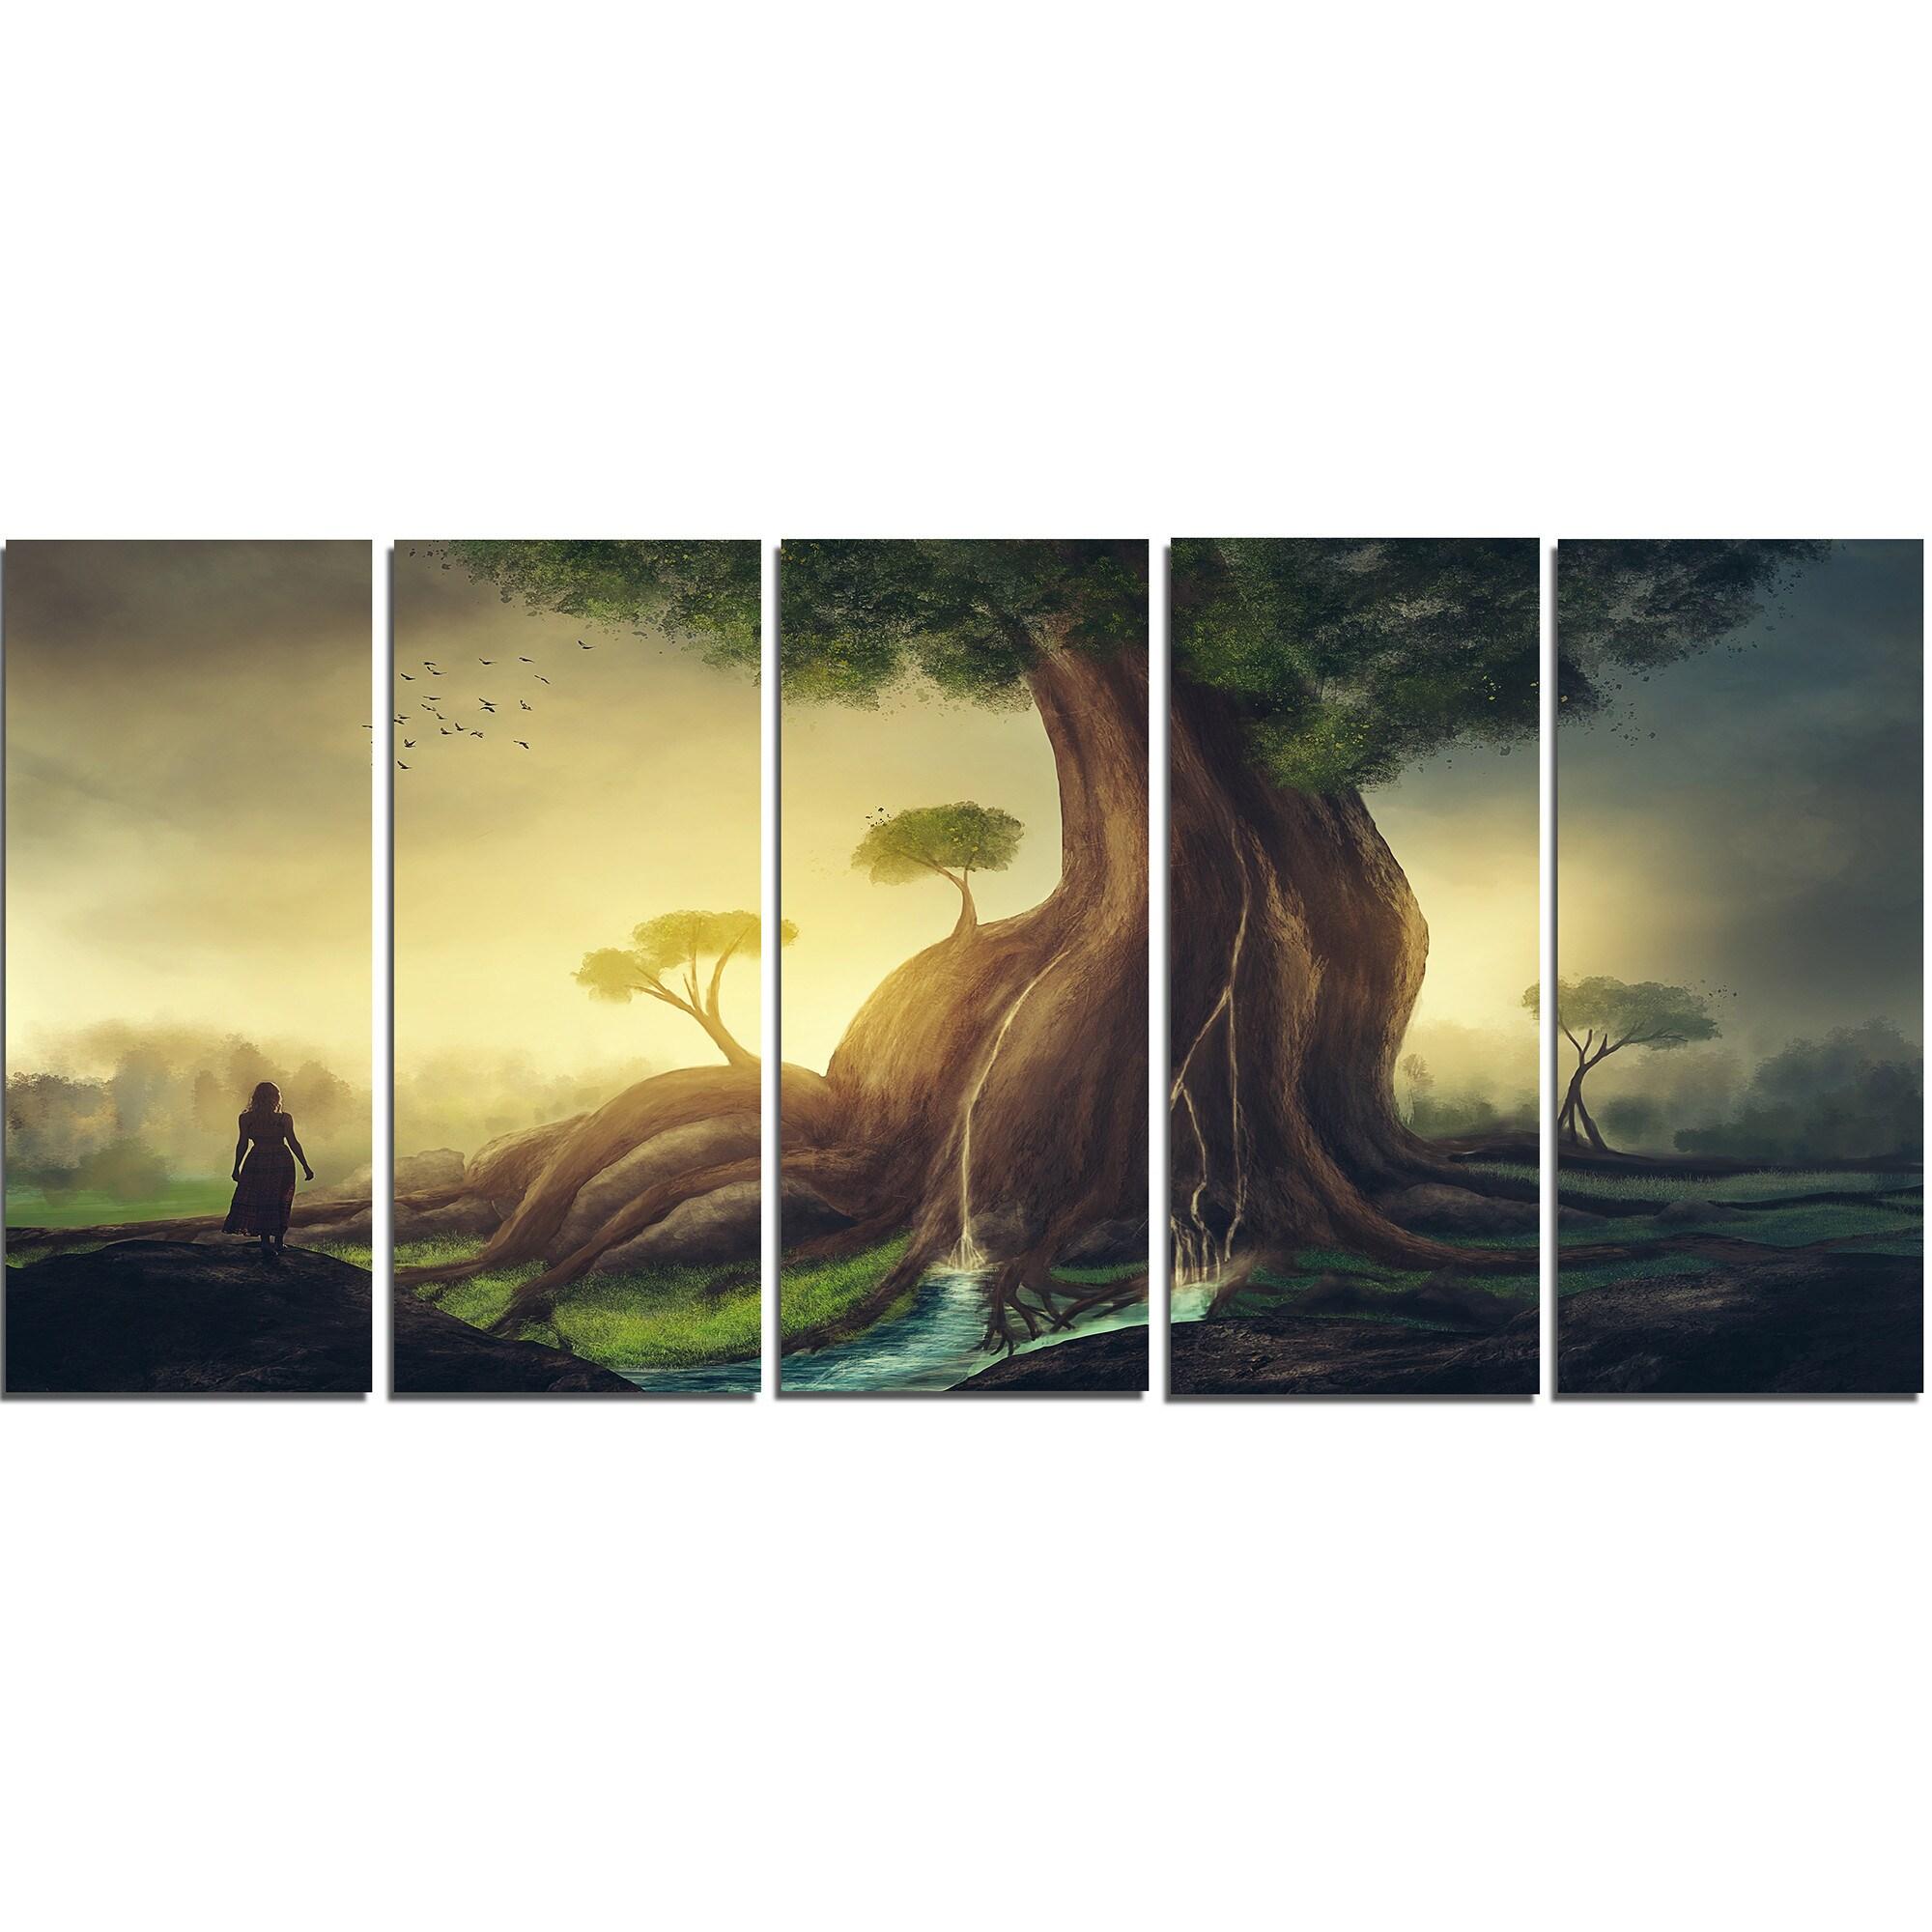 Modern Metal Oak Tree Wall Art Composition - All About Wallart ...